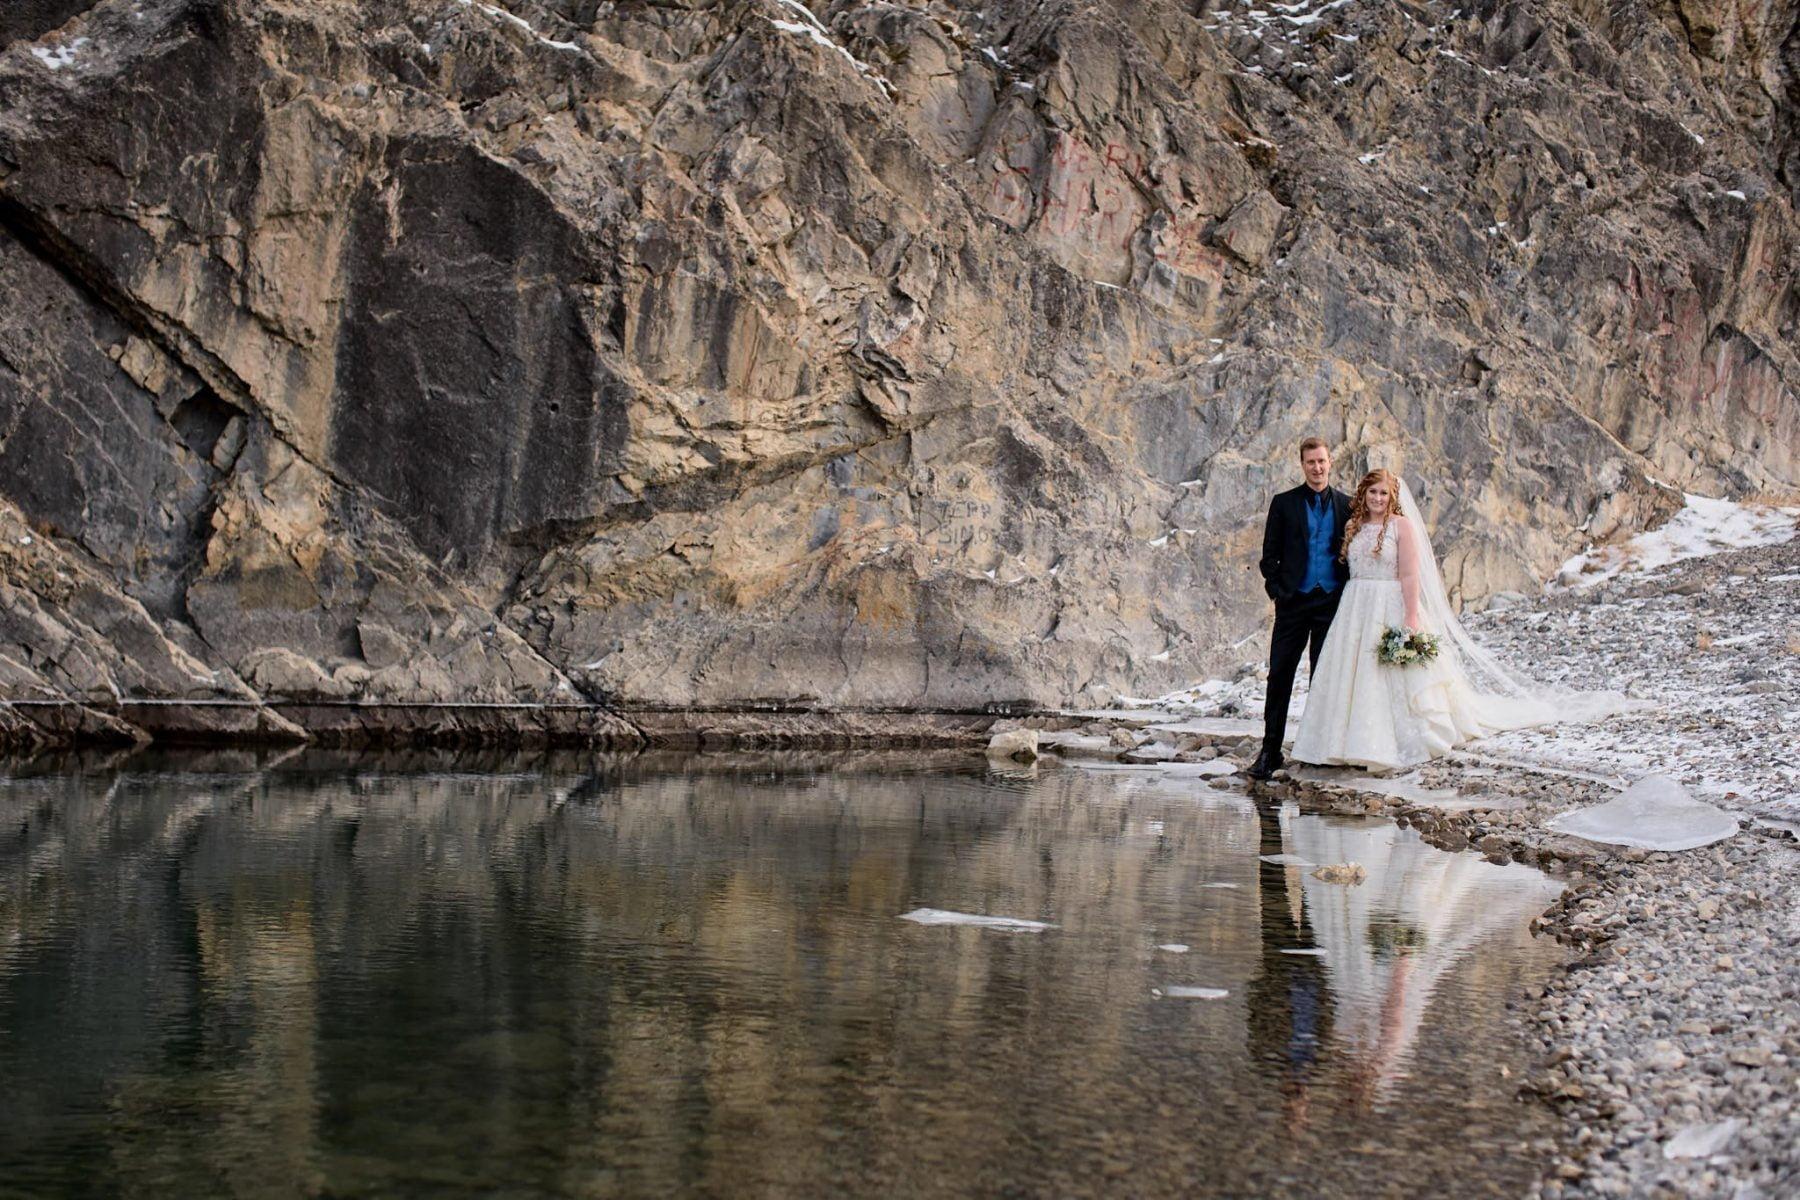 Wedding Photography reflection